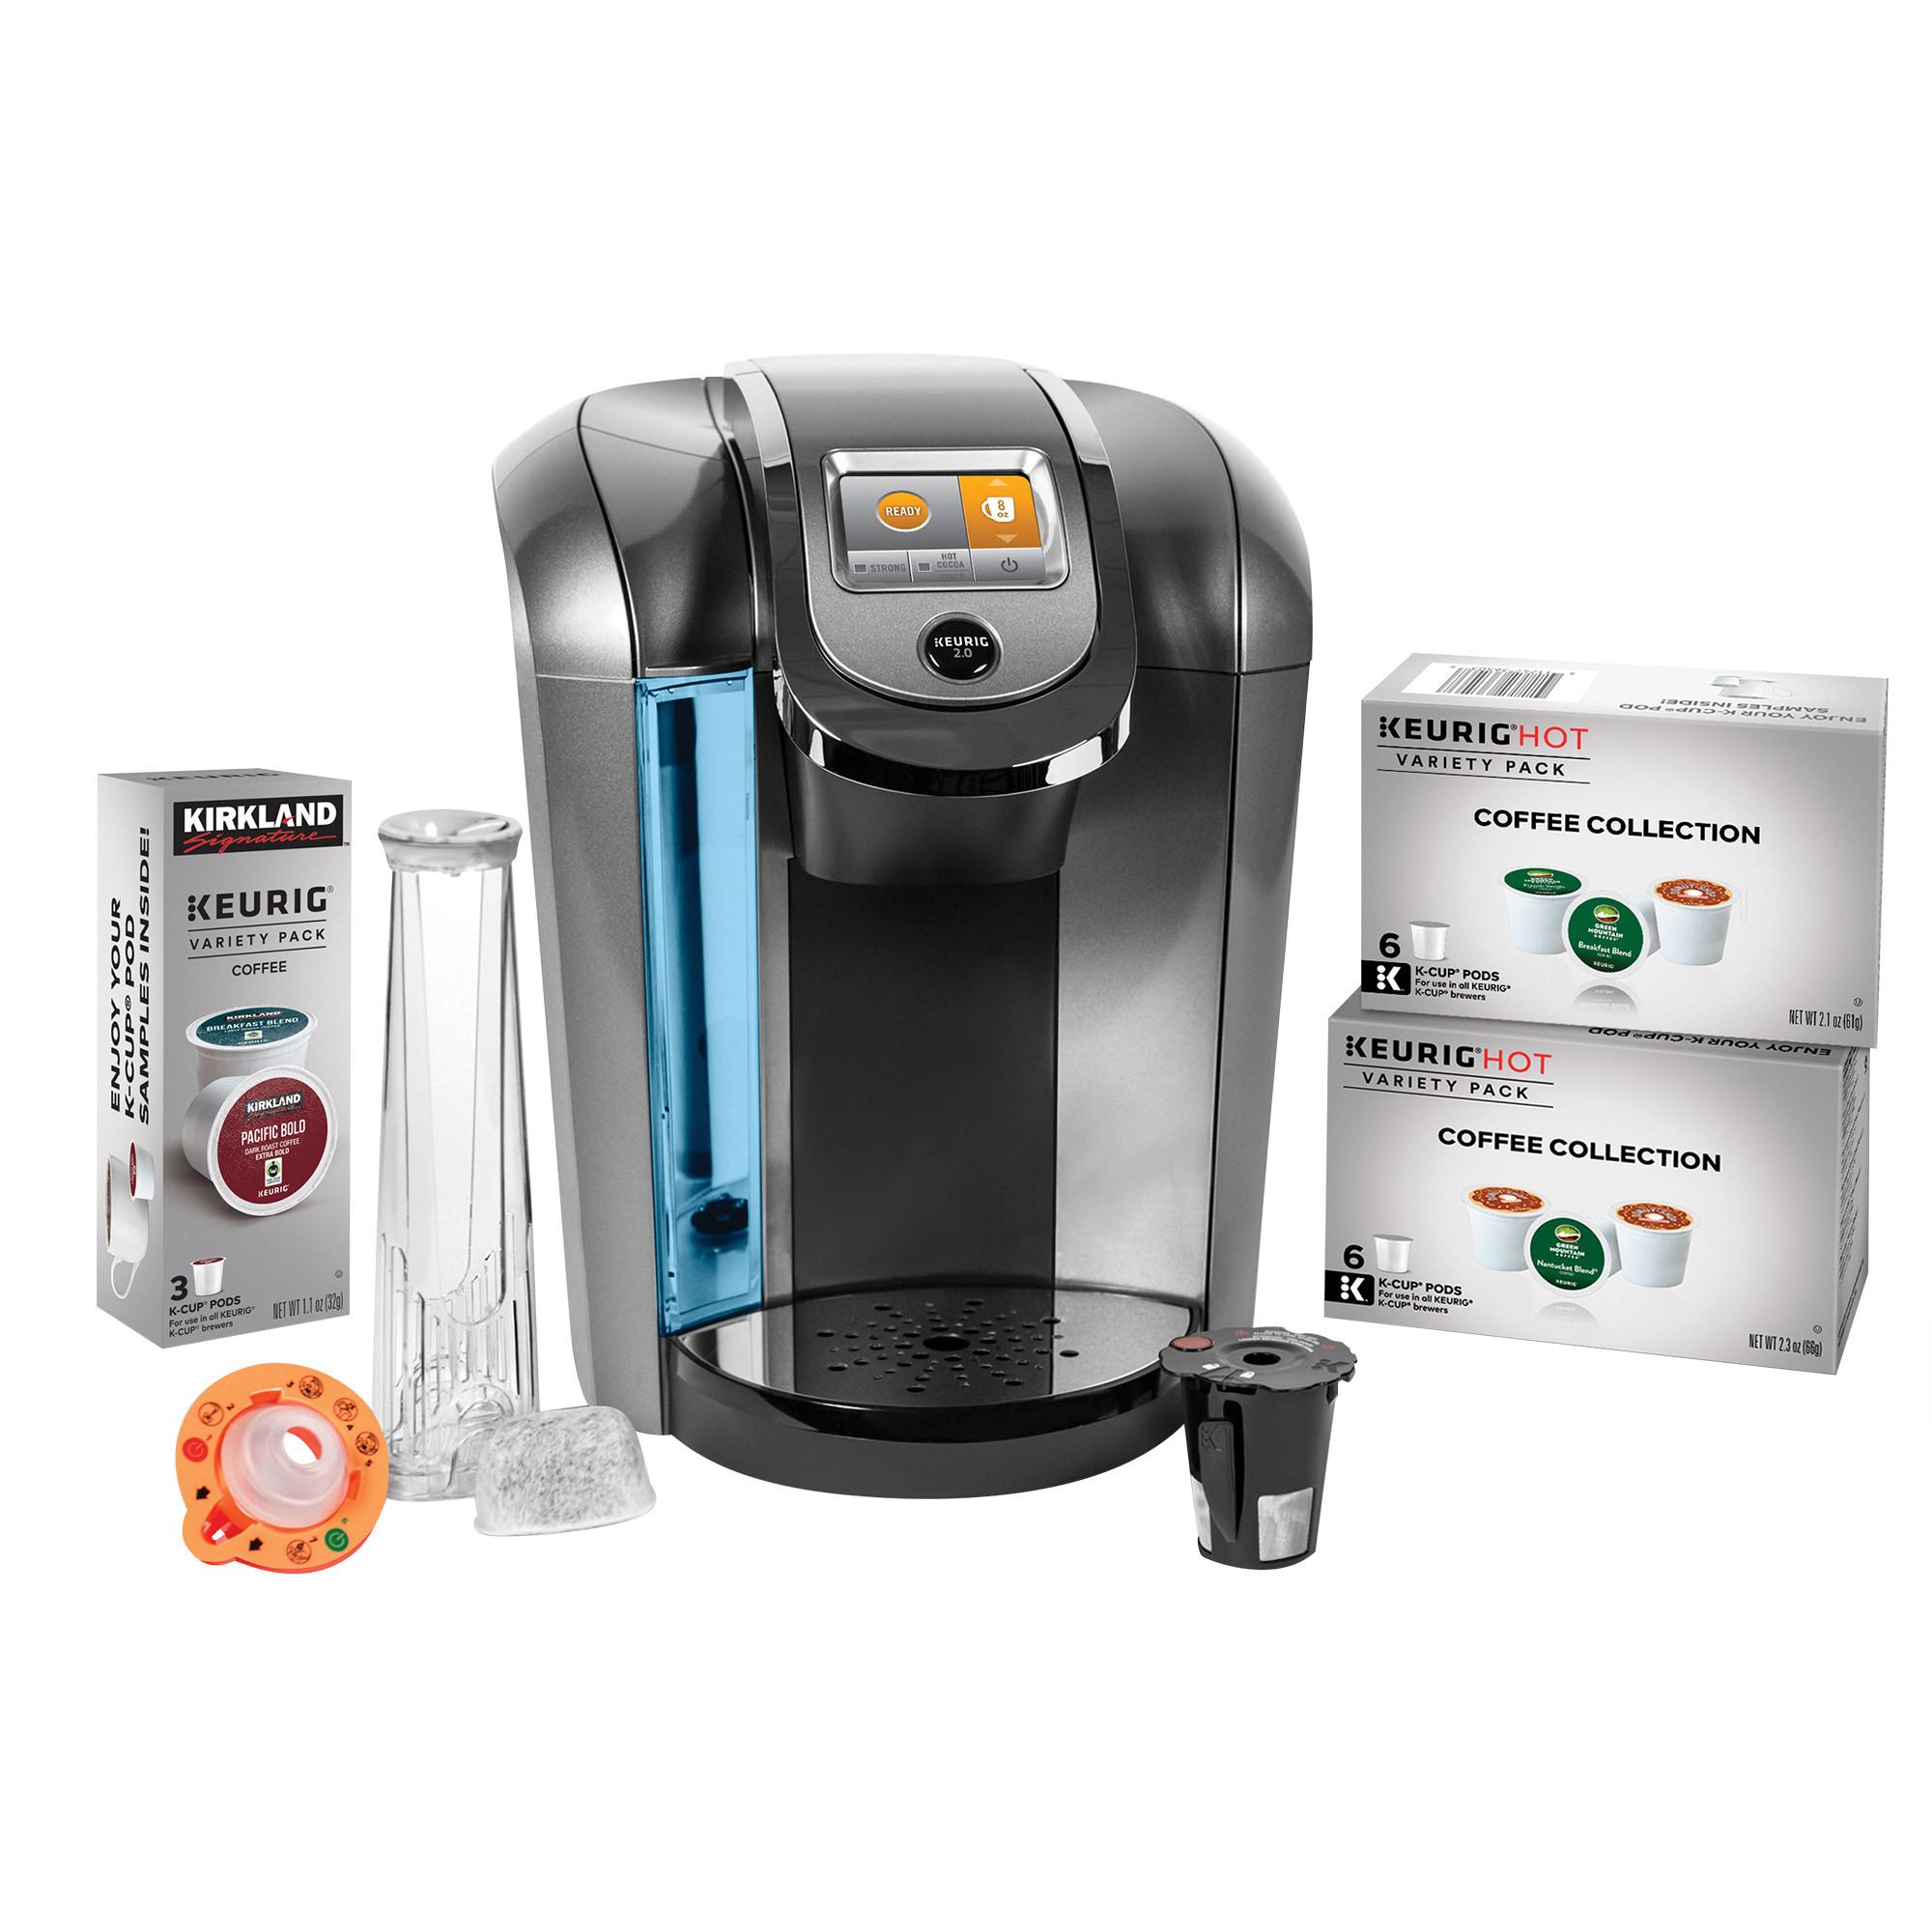 Keurig K525C Single Serve Coffee Maker 15 K-Cup Pods and My K-Cup 2.0